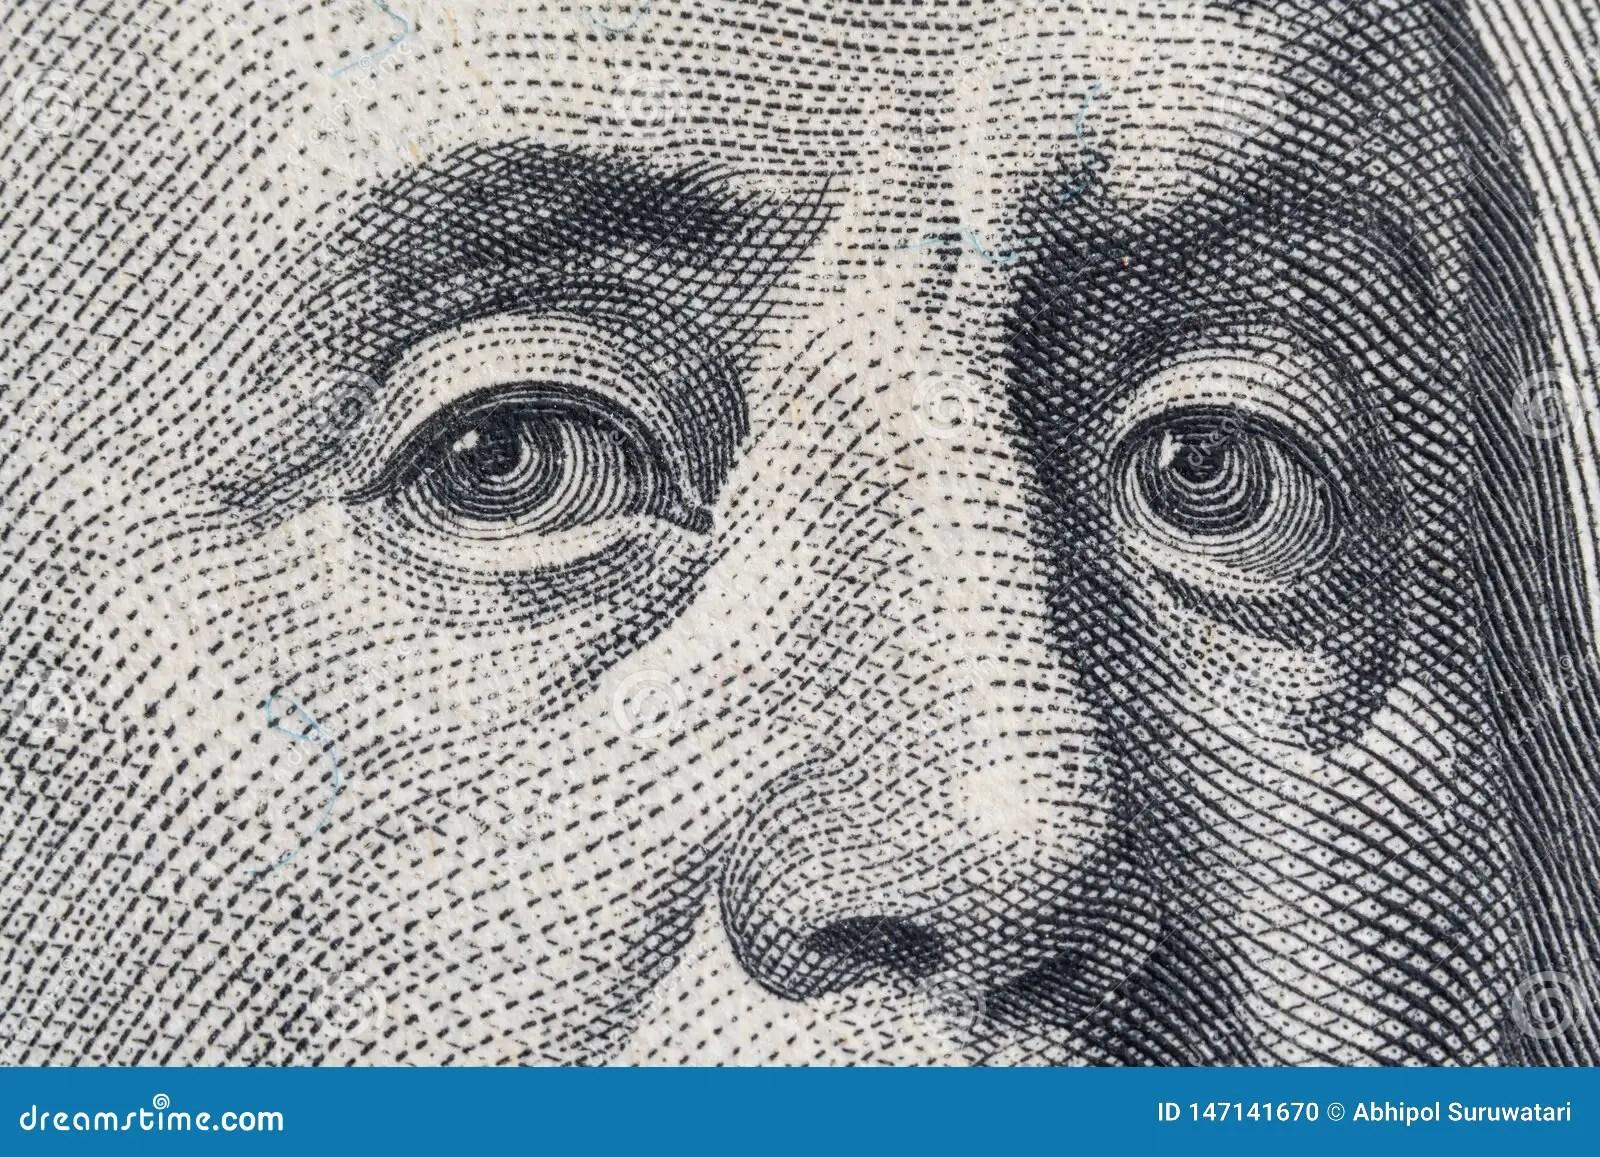 Macro Close Up Of The Us 100 Dollar Bill Extreme Macro